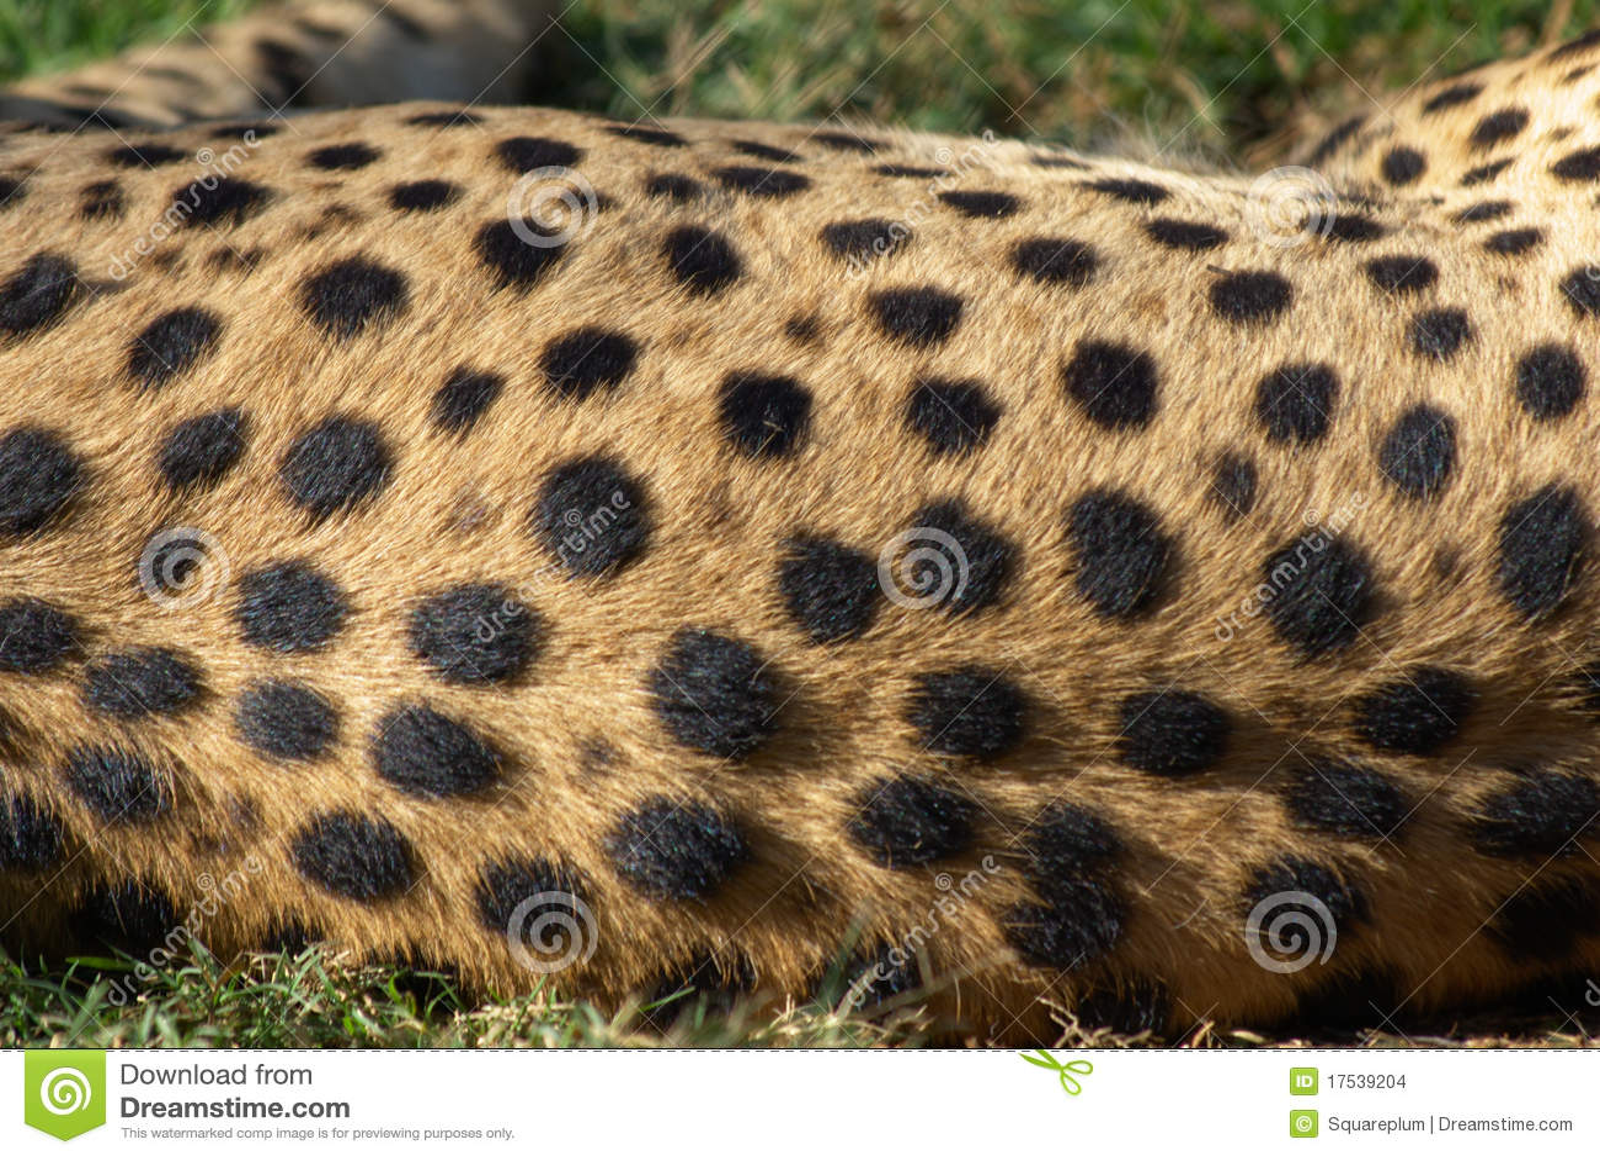 Cheetah Fur Close Up Cheetah Fur Sto...